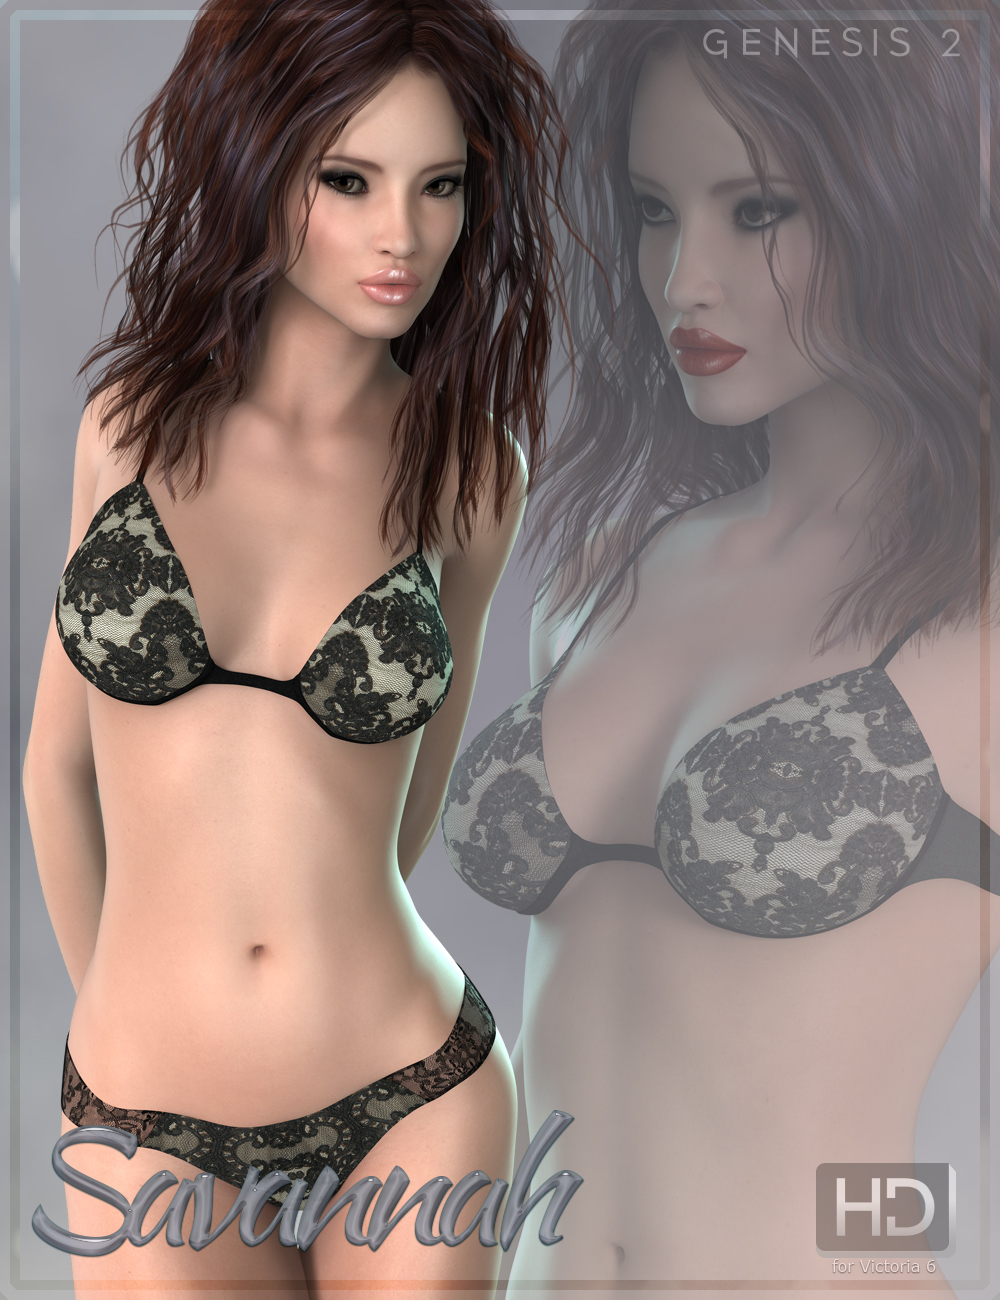 FW Savannah HD for Victoria 6 by: Fred Winkler Art, 3D Models by Daz 3D